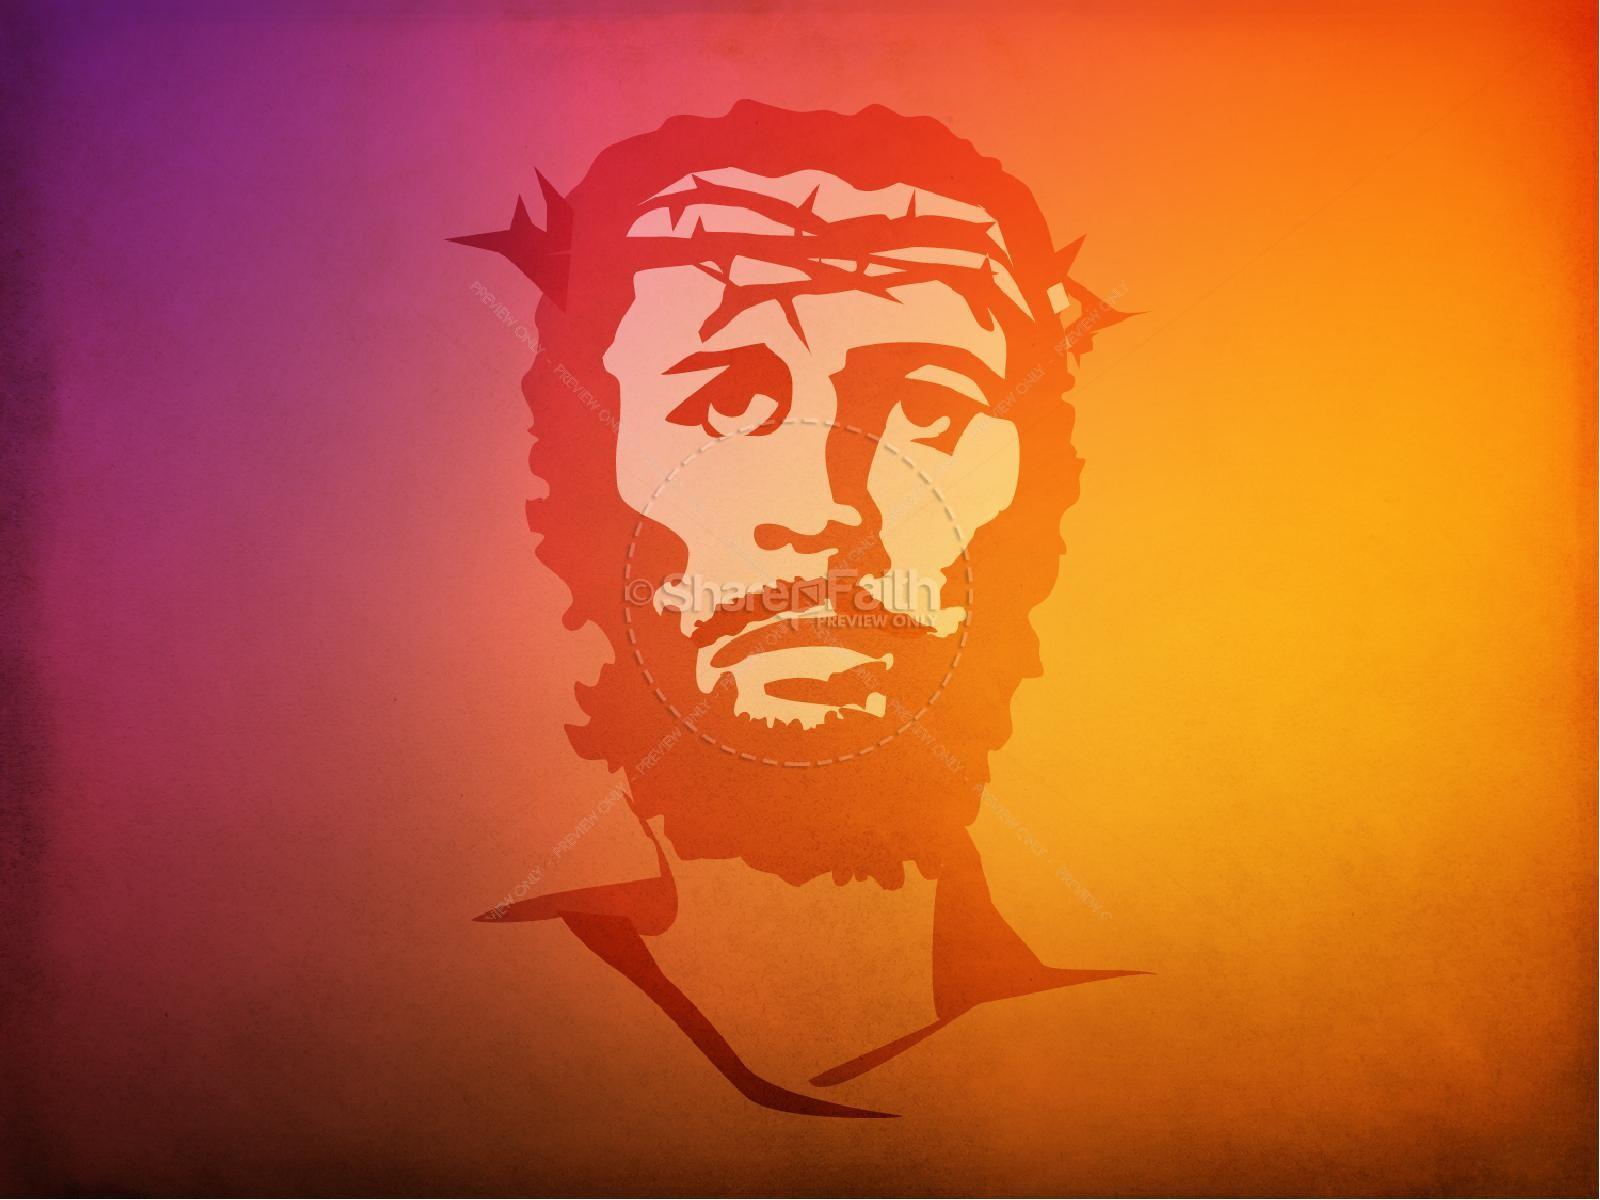 Jesus on the Cross PowerPoint Template | slide 7